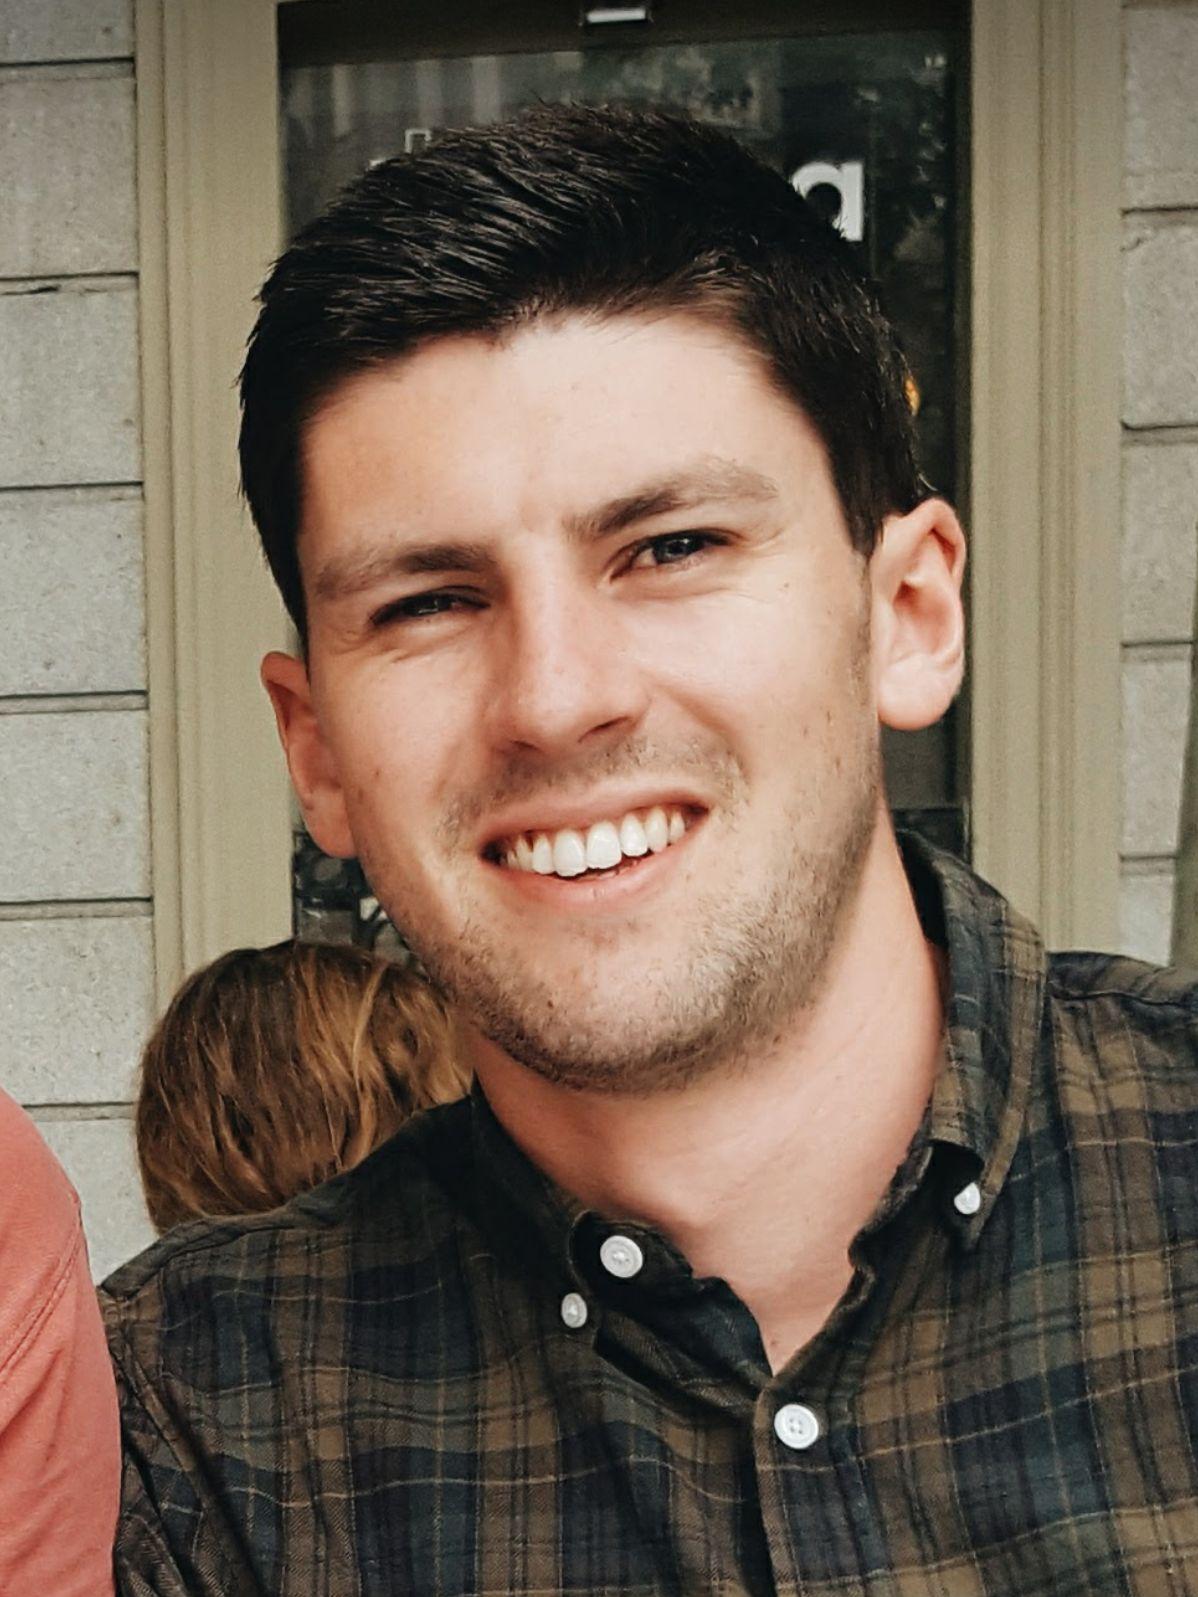 Adam Jamieson